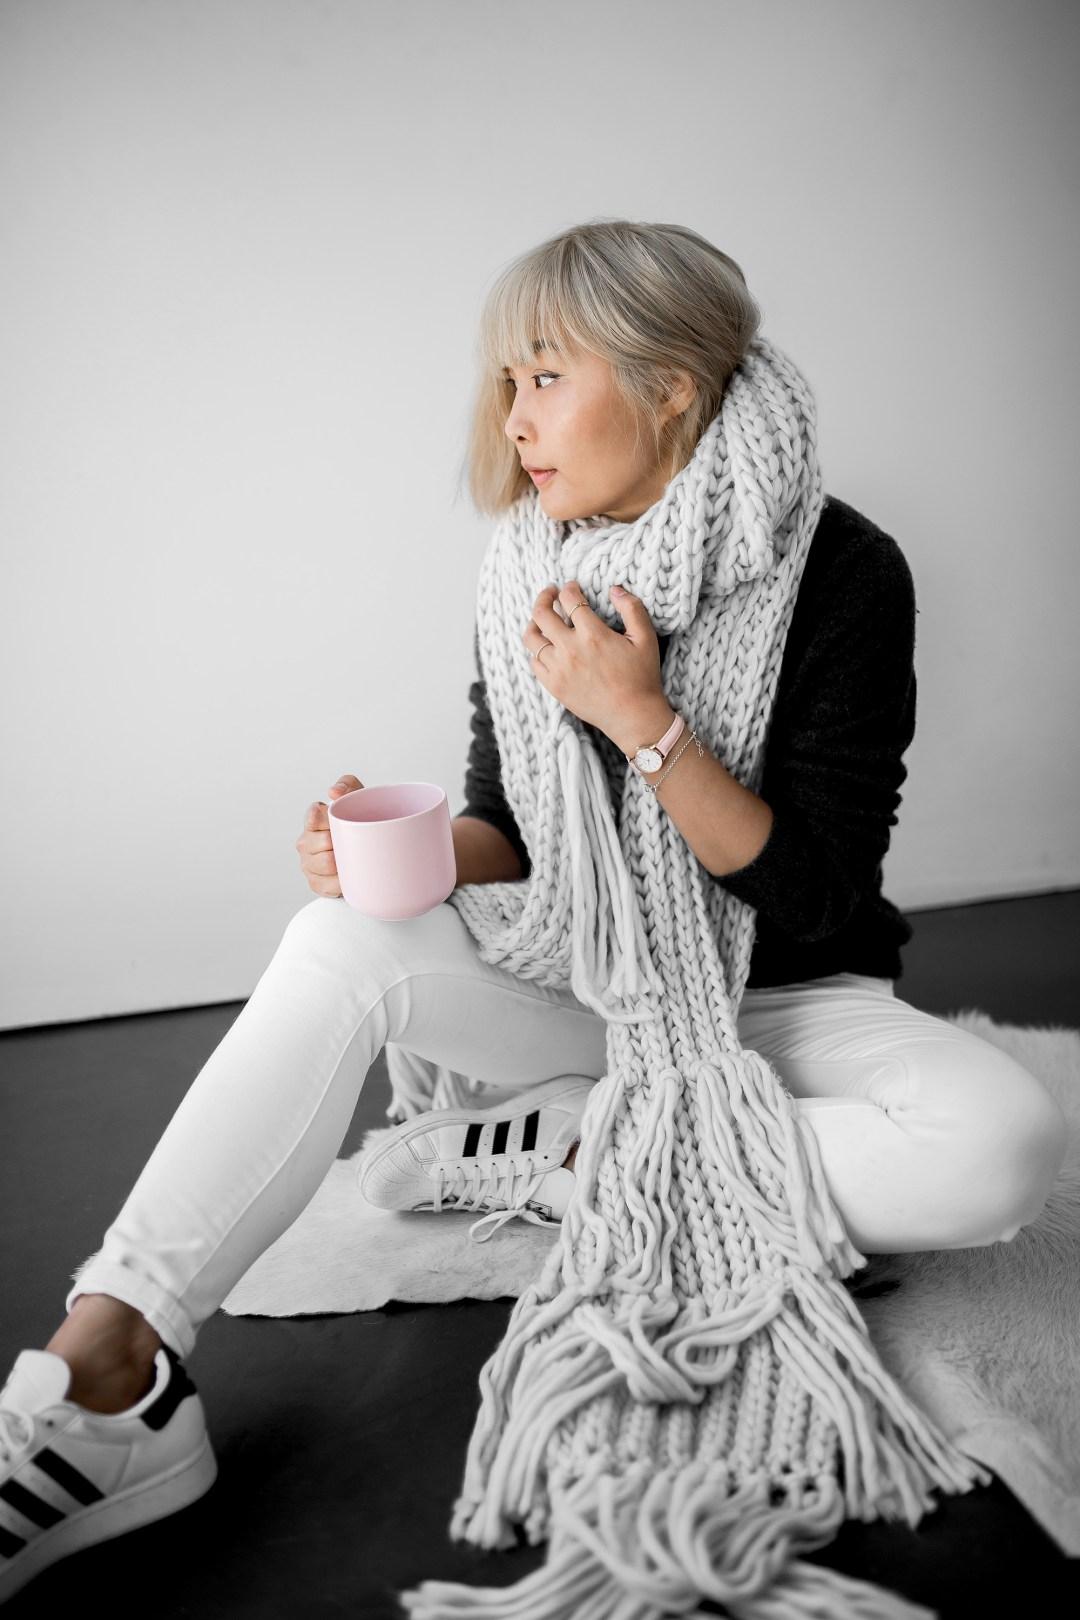 chunky-scarf-adidas-superstar-coffee-morning-inspiration-2-copy